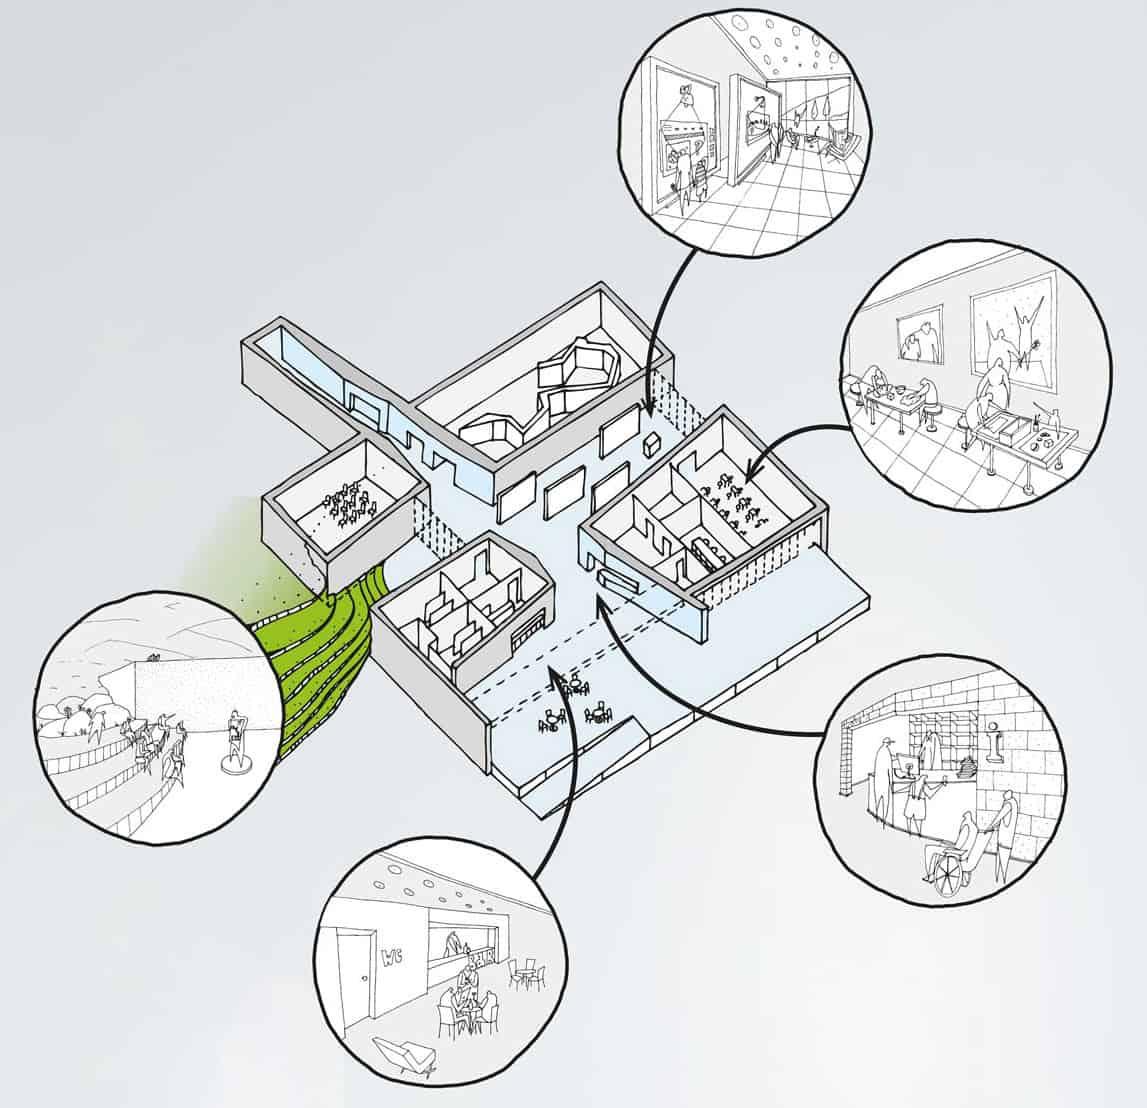 CEBRA | פורנו רך לאדריכלים 7